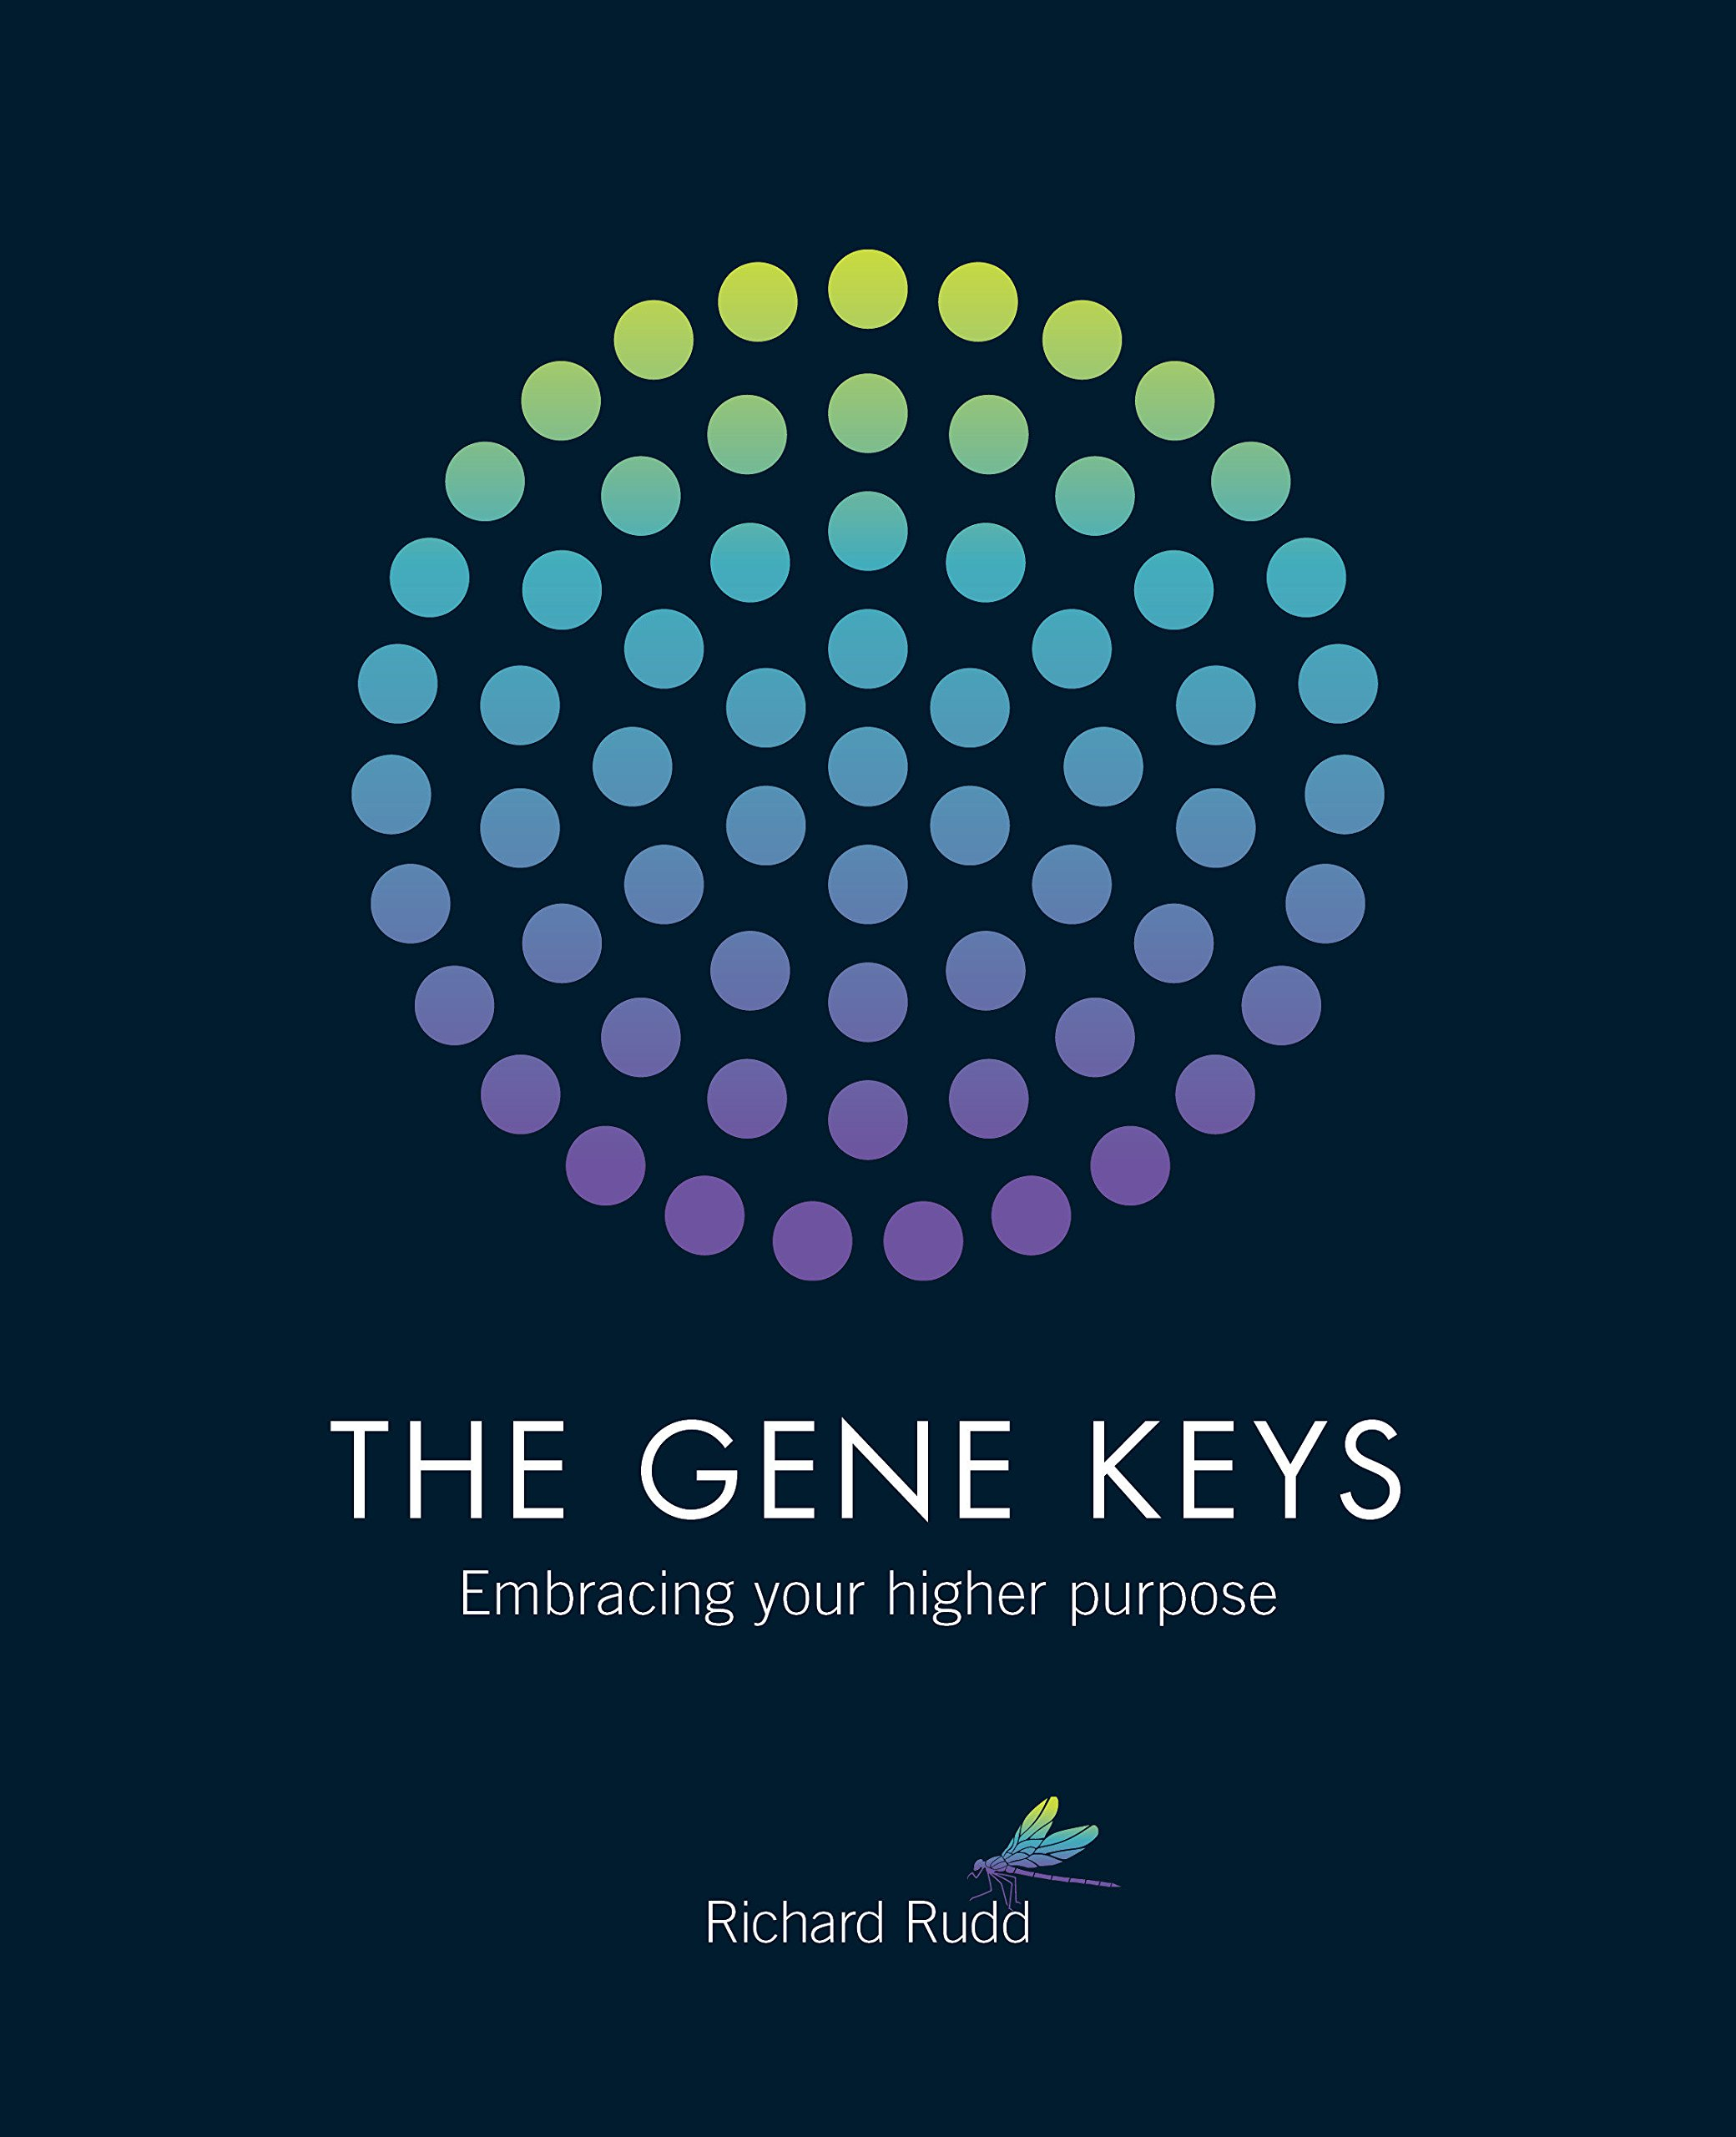 Gene Keys Unlocking Higher Purpose